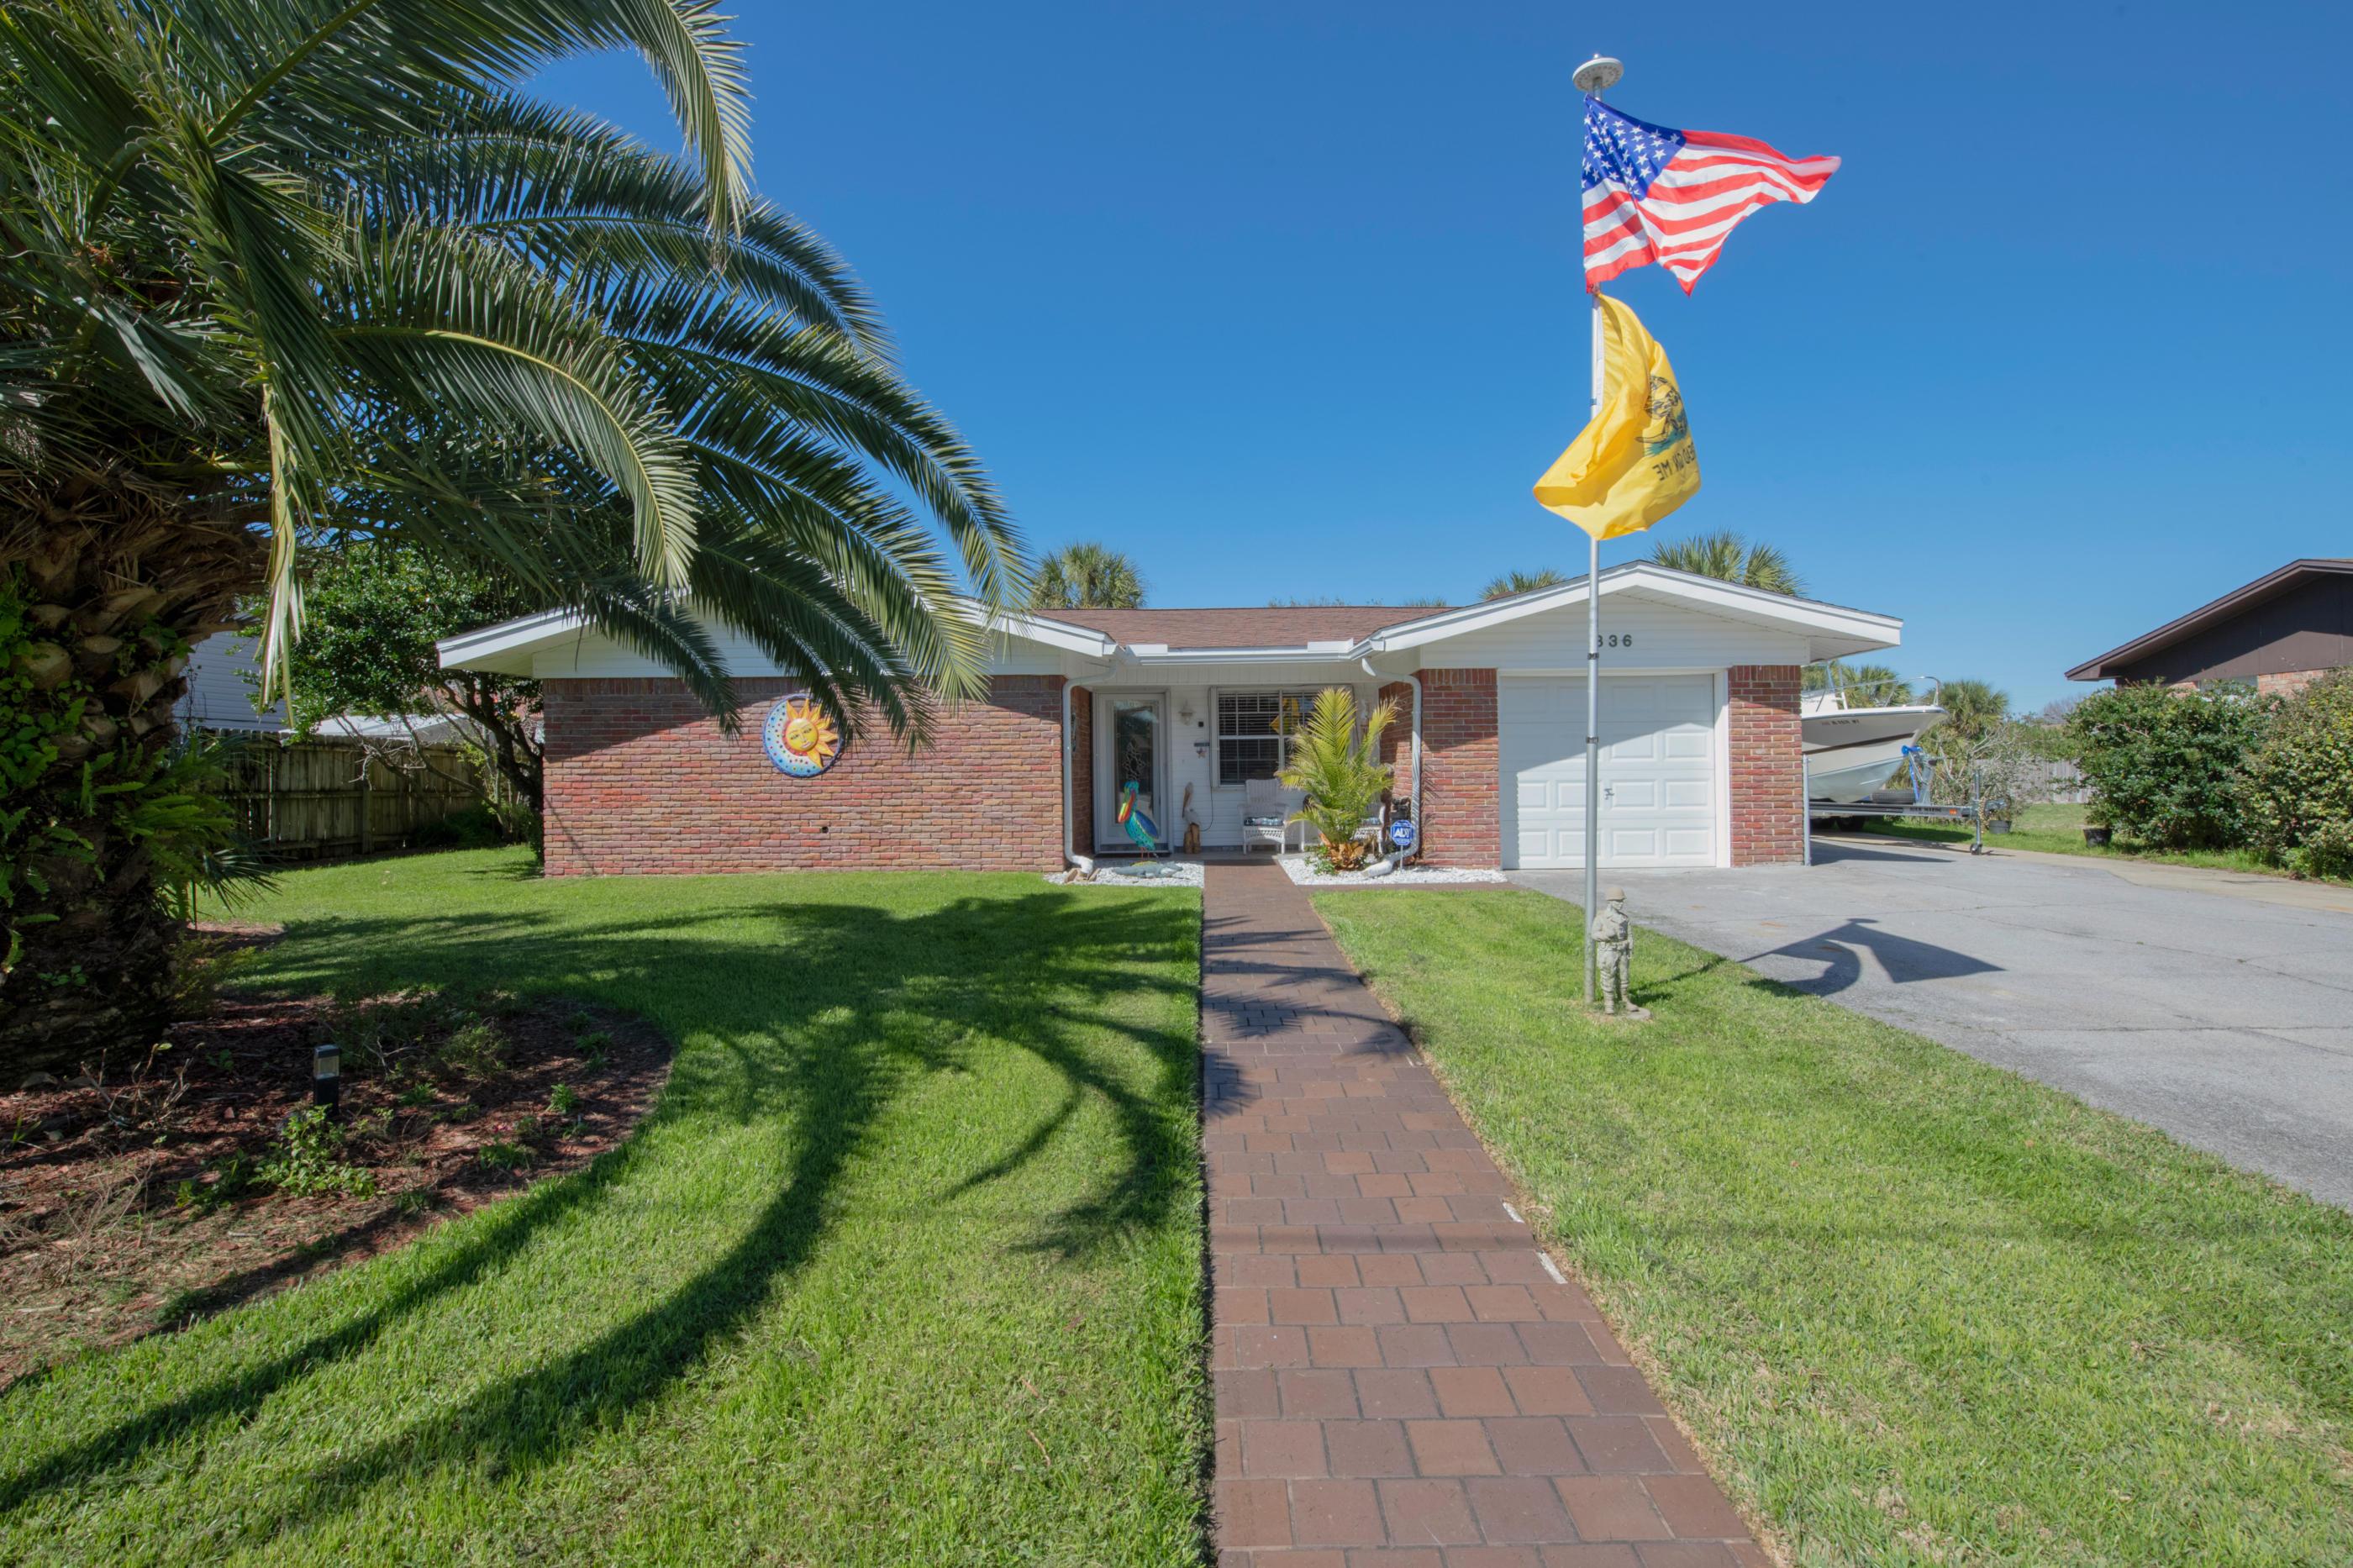 836 Tropic Avenue, Fort Walton Beach, FL 32548